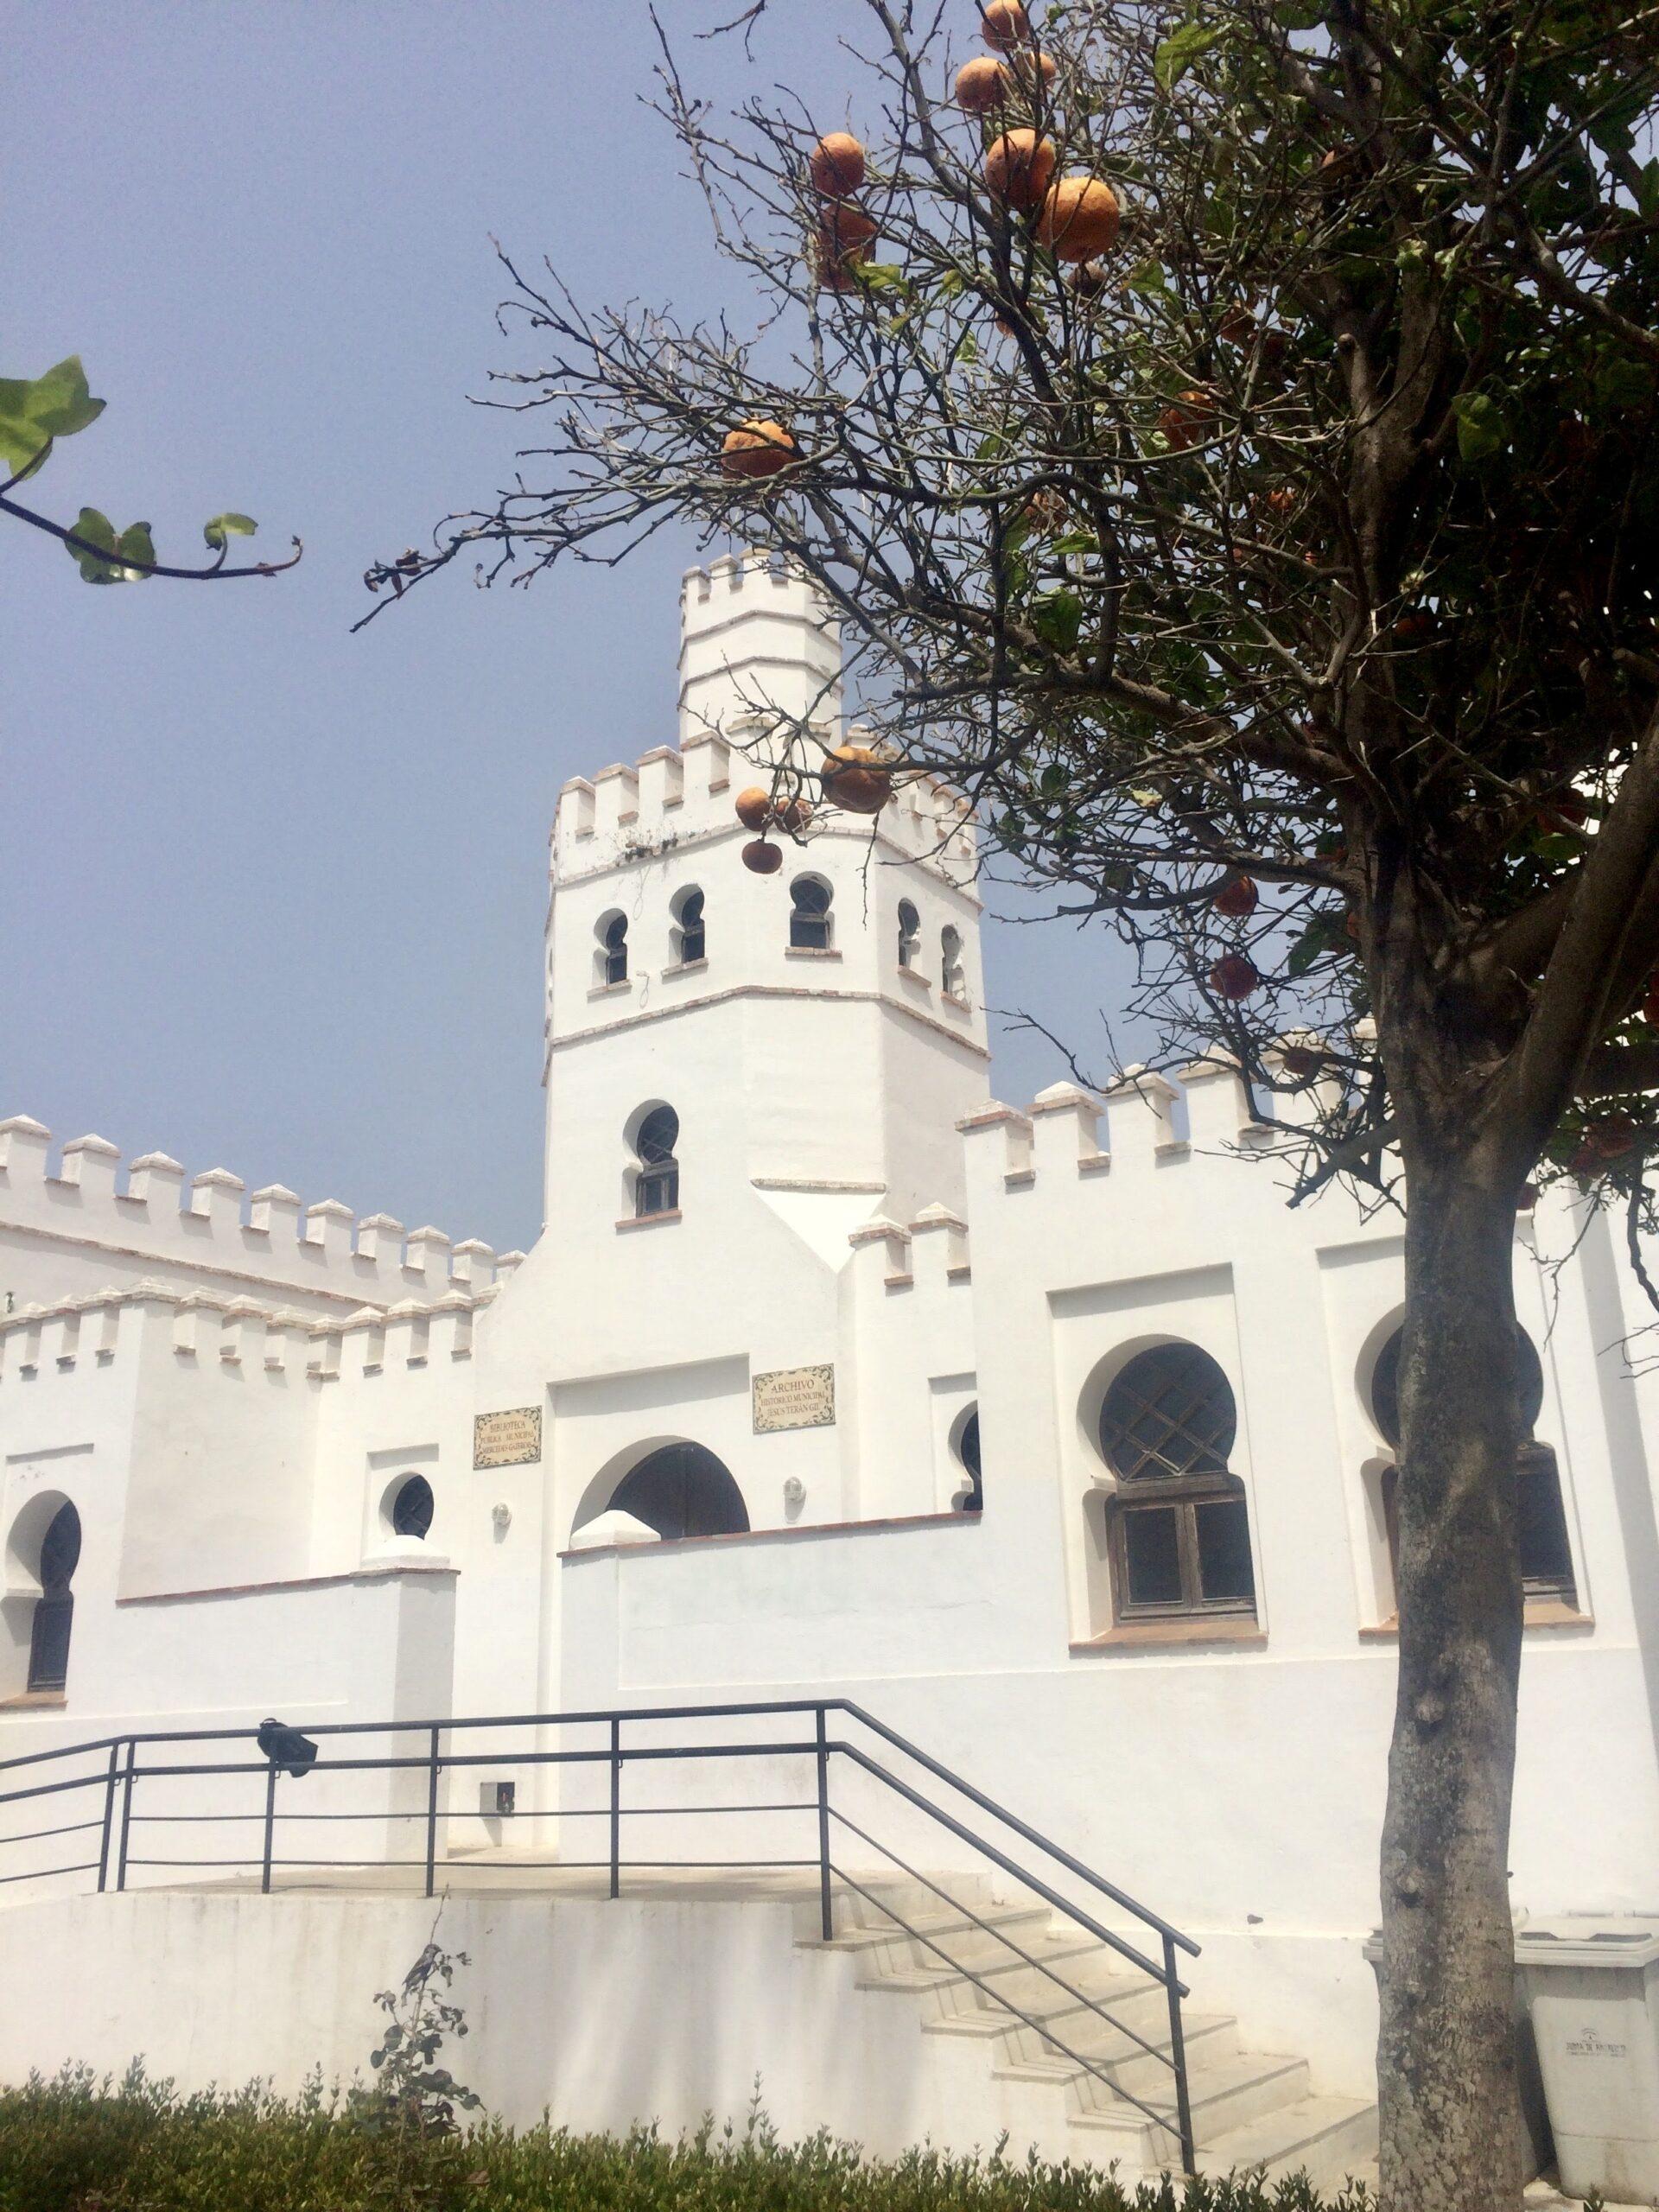 Plazuela del Viento Tarifa